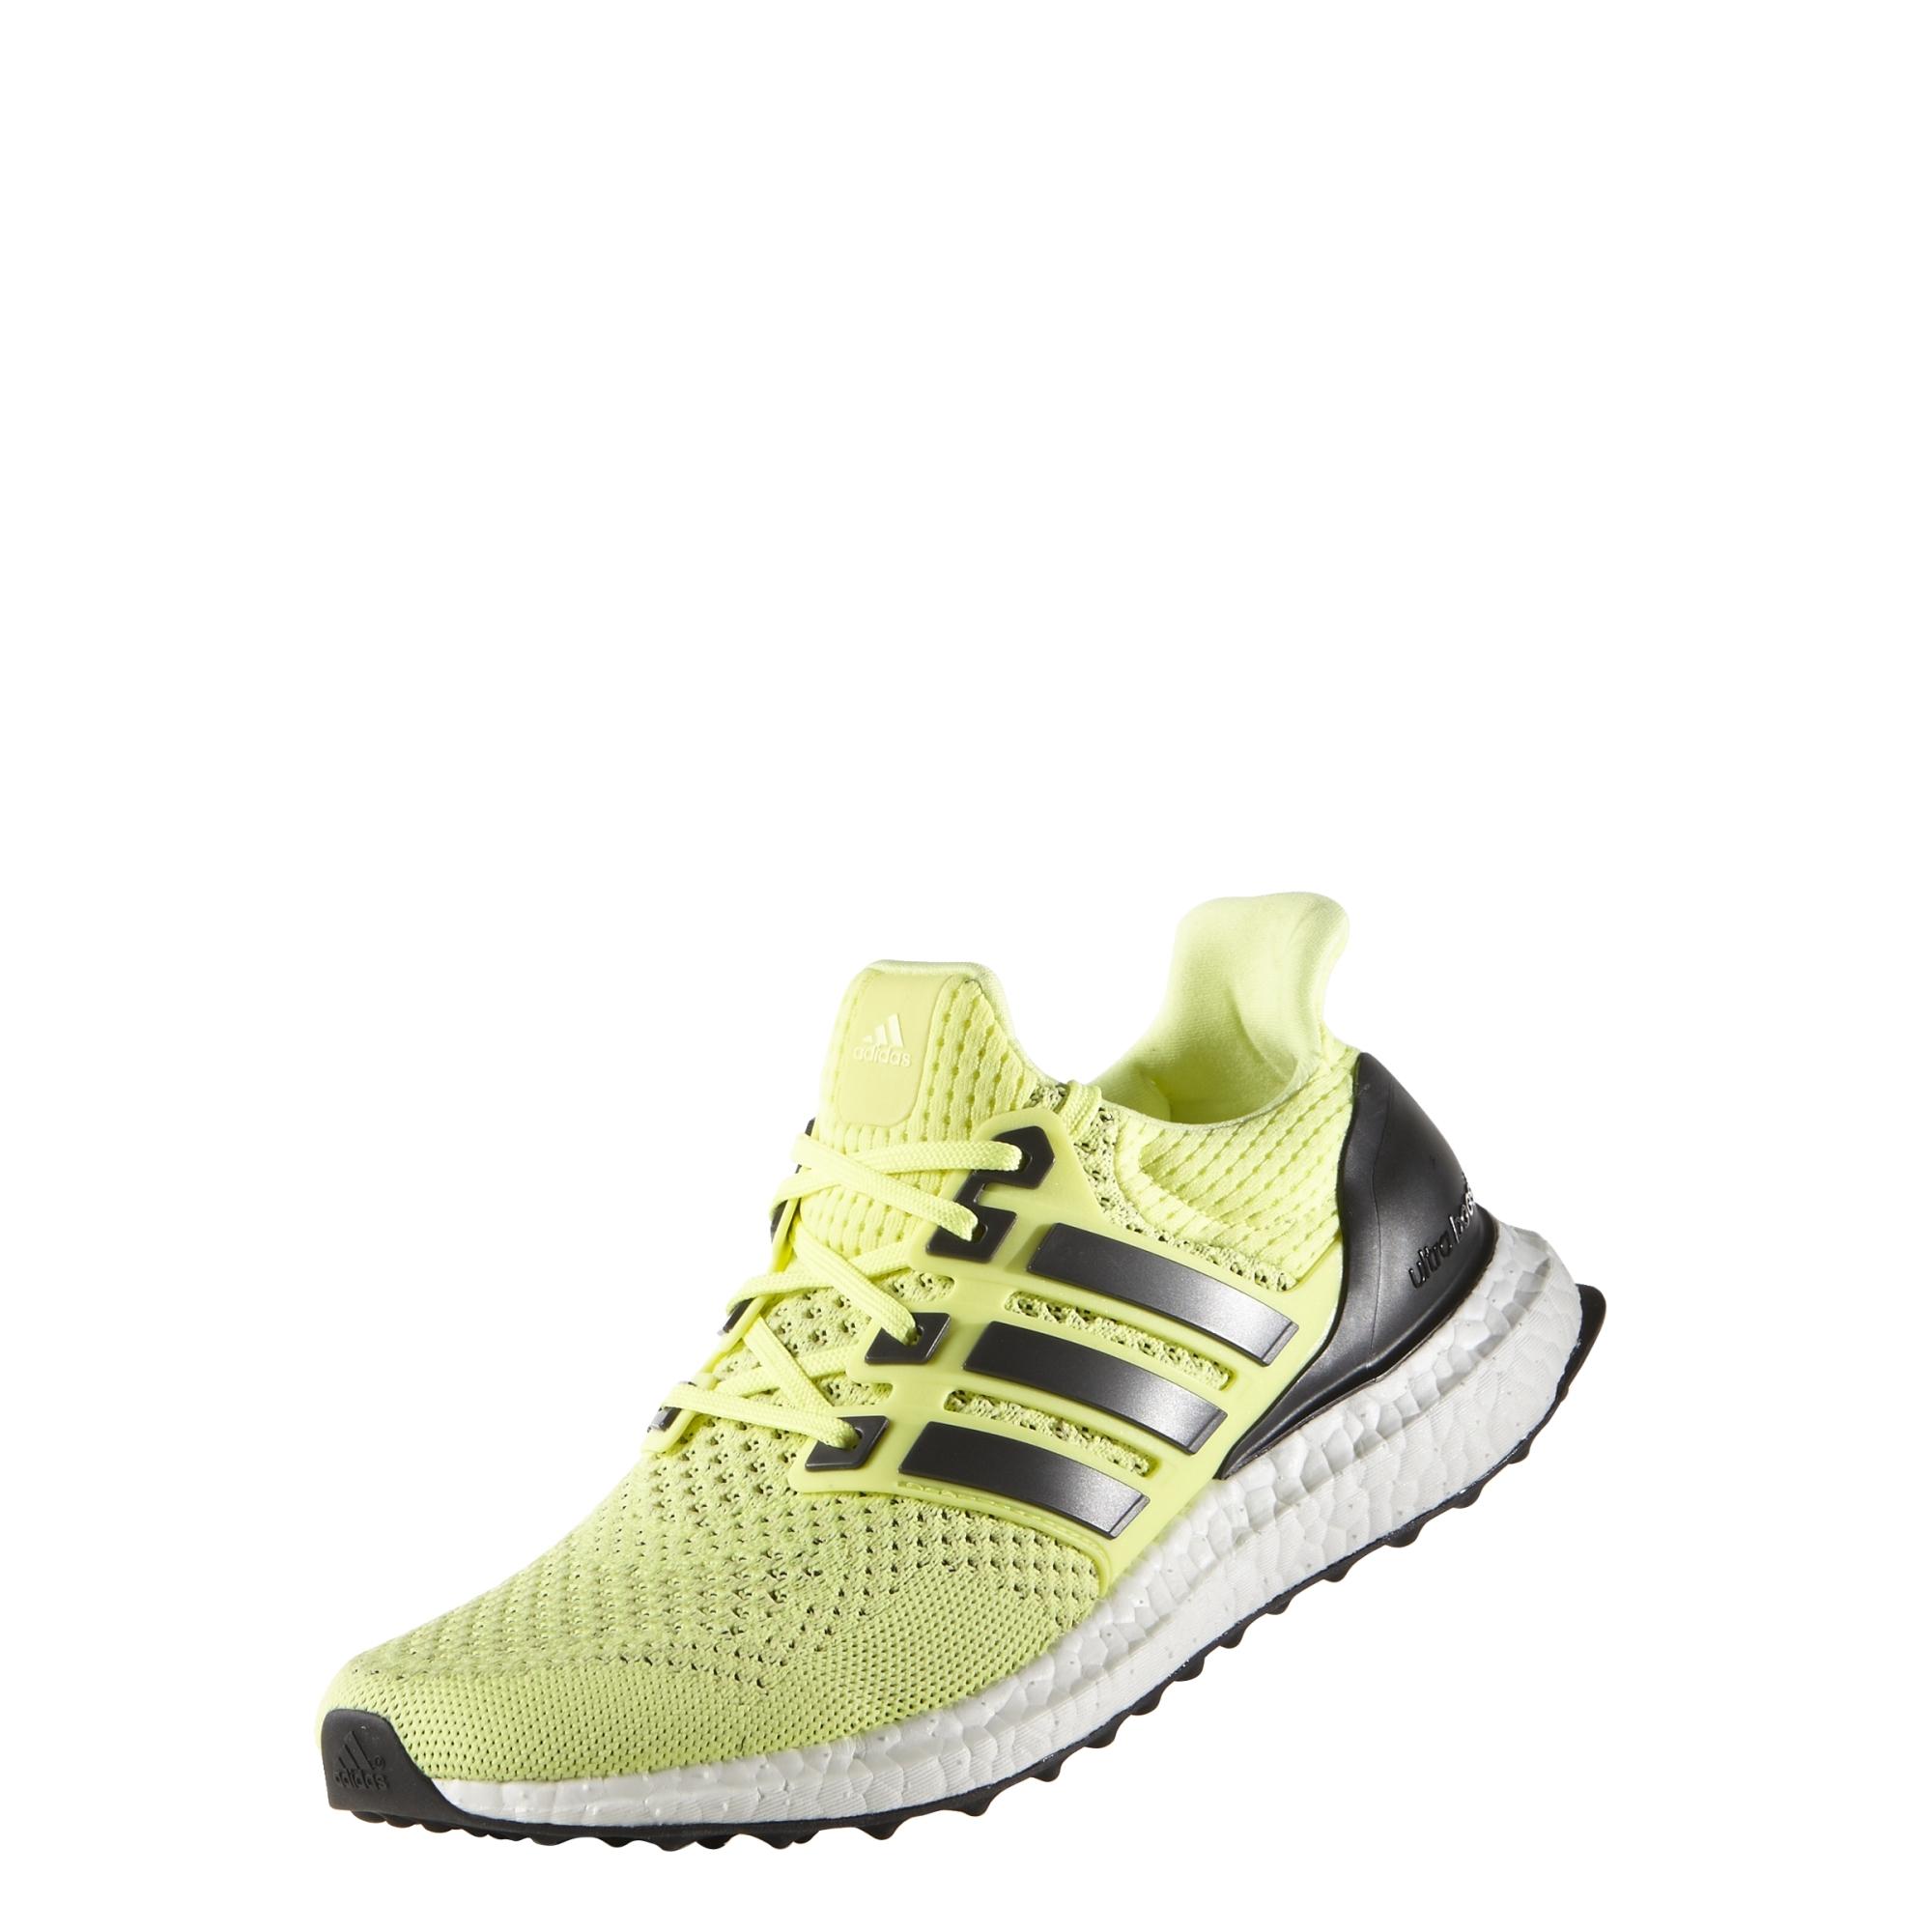 hot sale online 2acb7 2b760 ... buty adidas Ultra Boost W S77512 ...